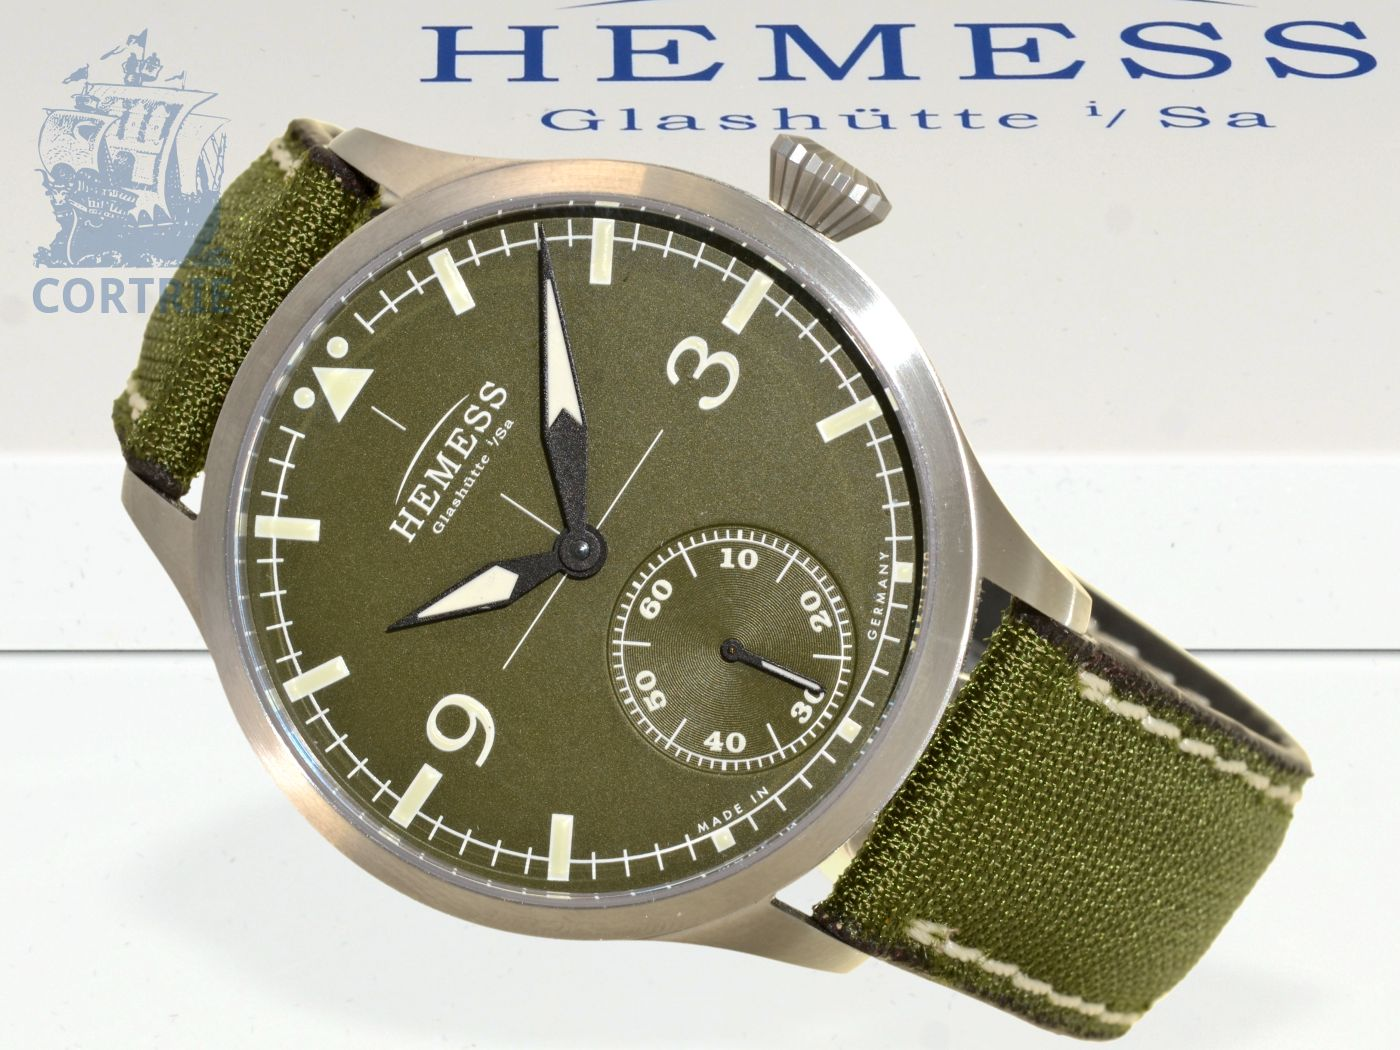 Wristwatch: high-class Glashütte pilot's watch Pilotuhr Hemess, reference A01094, unused, with original box and certificates-